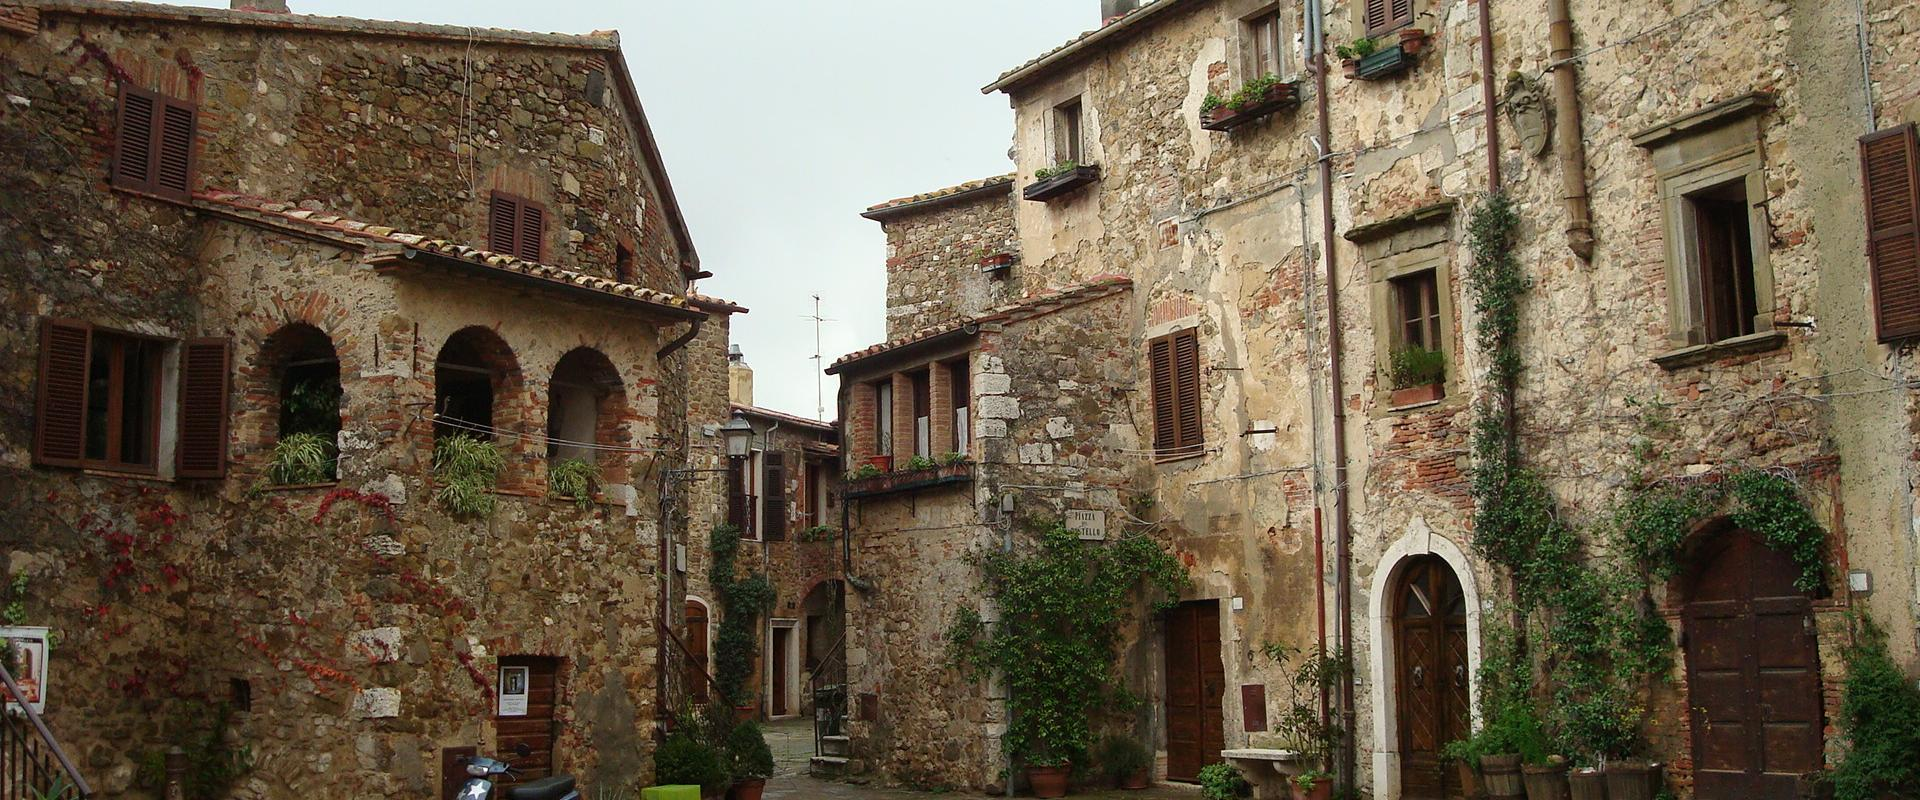 Montemerano Tuscany